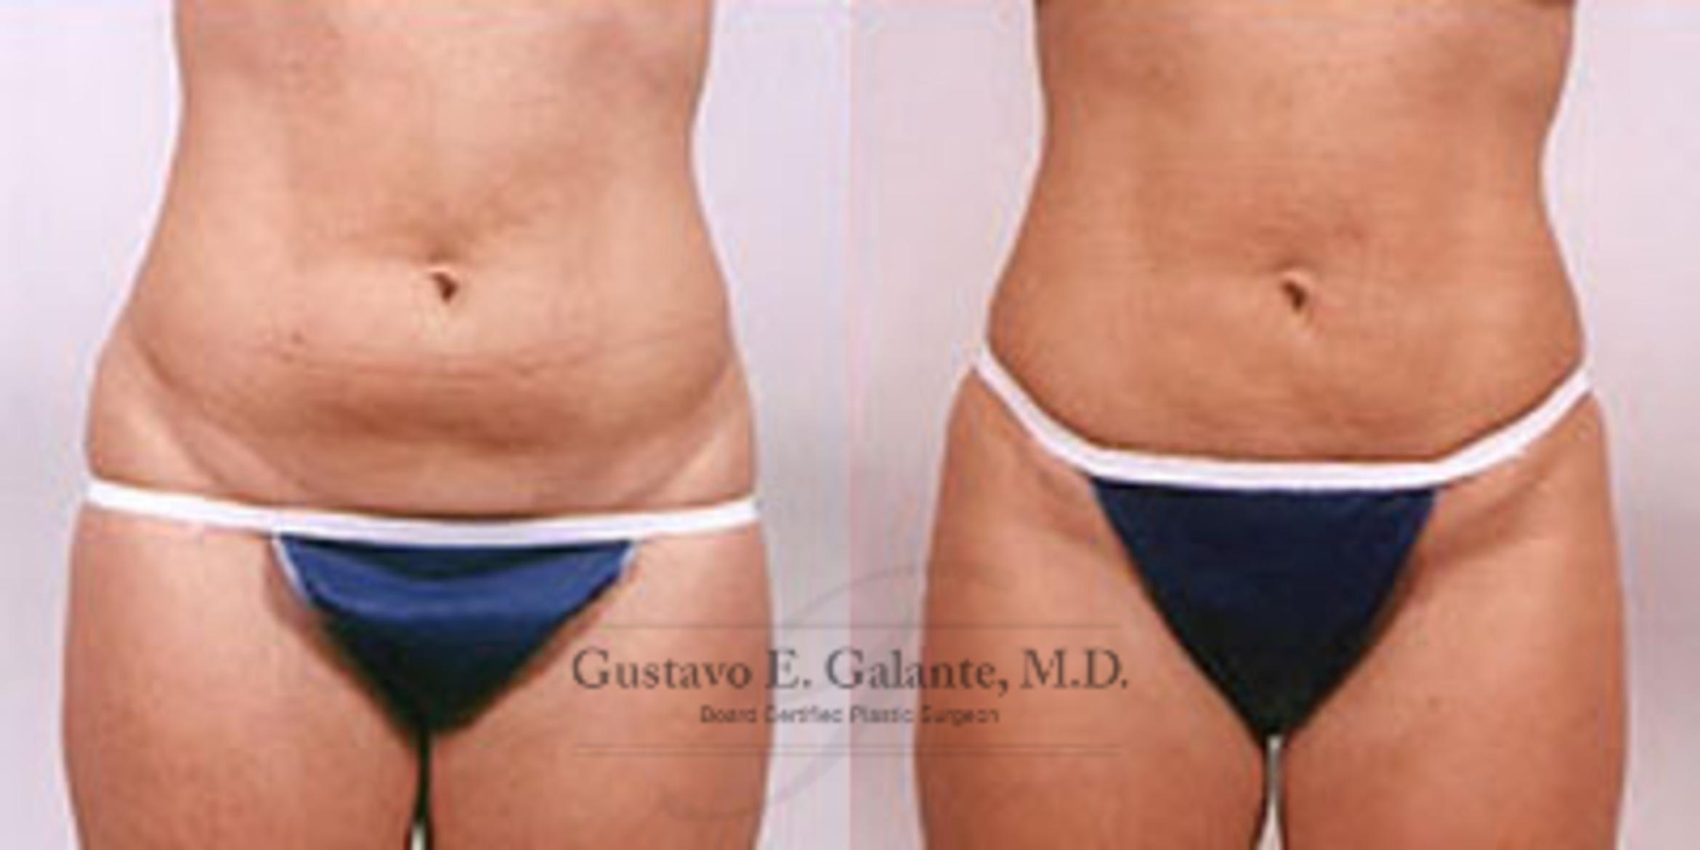 Liposuction In Valparaiso Schererville Indiana Dr Galante